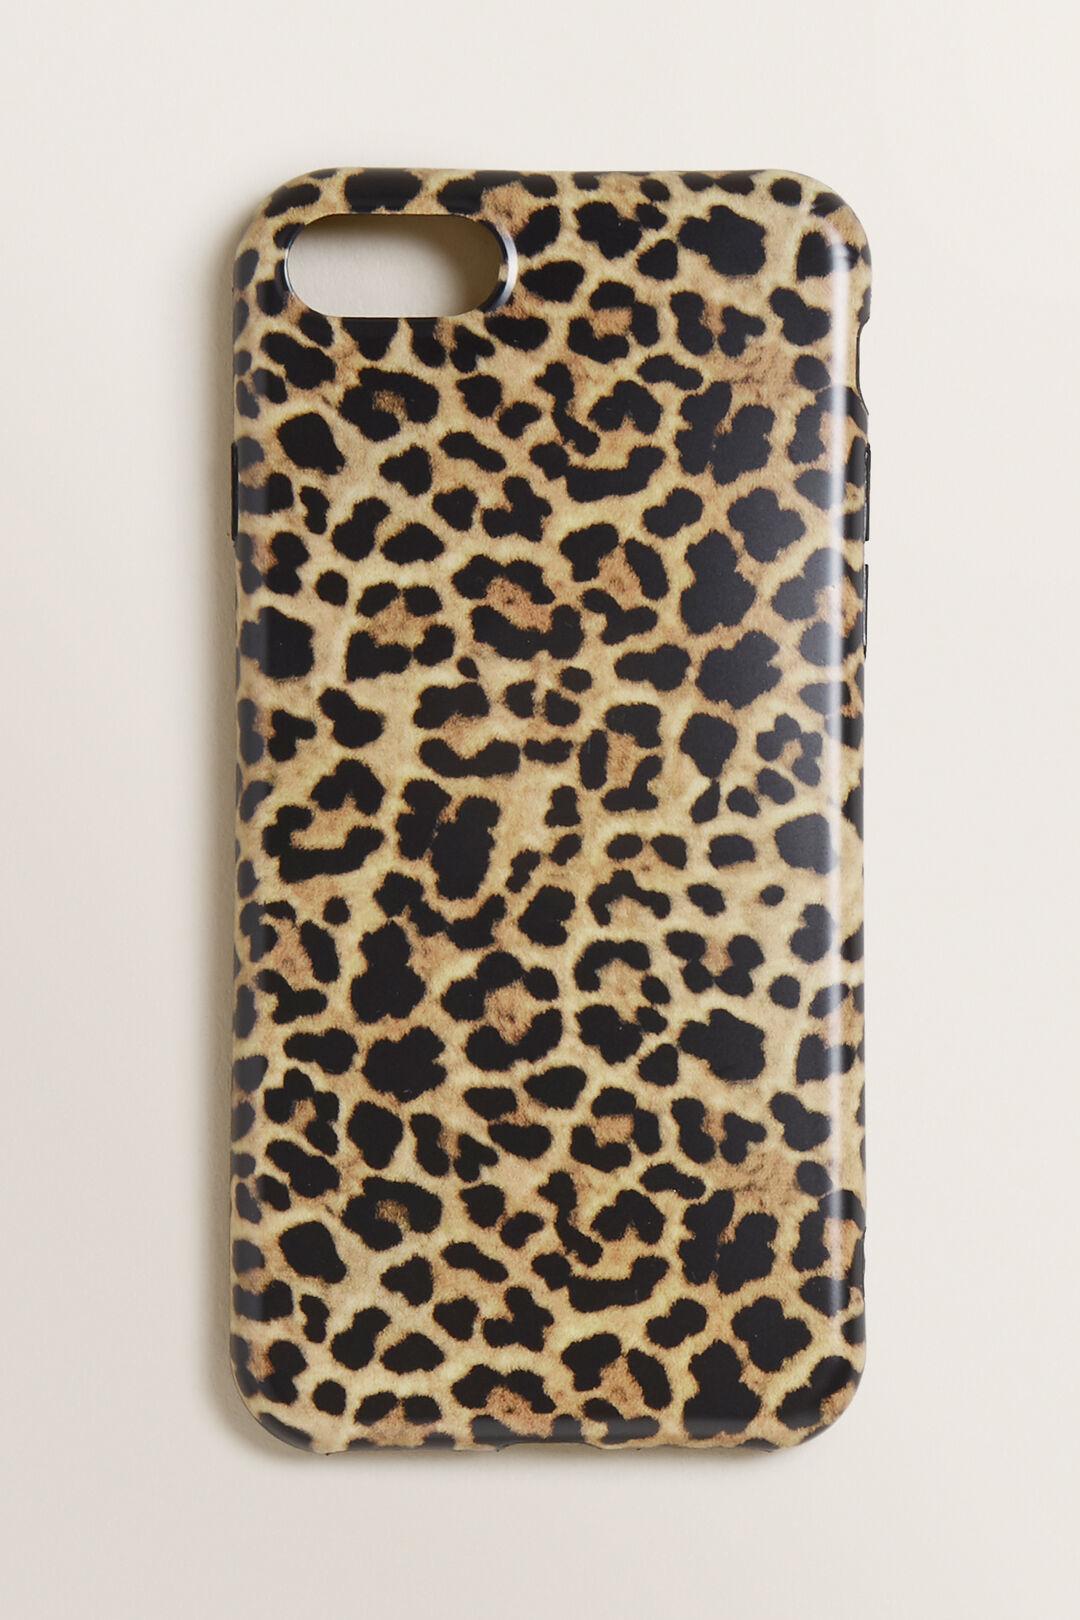 Printed Phone Case X/XS  LEOPARD  hi-res